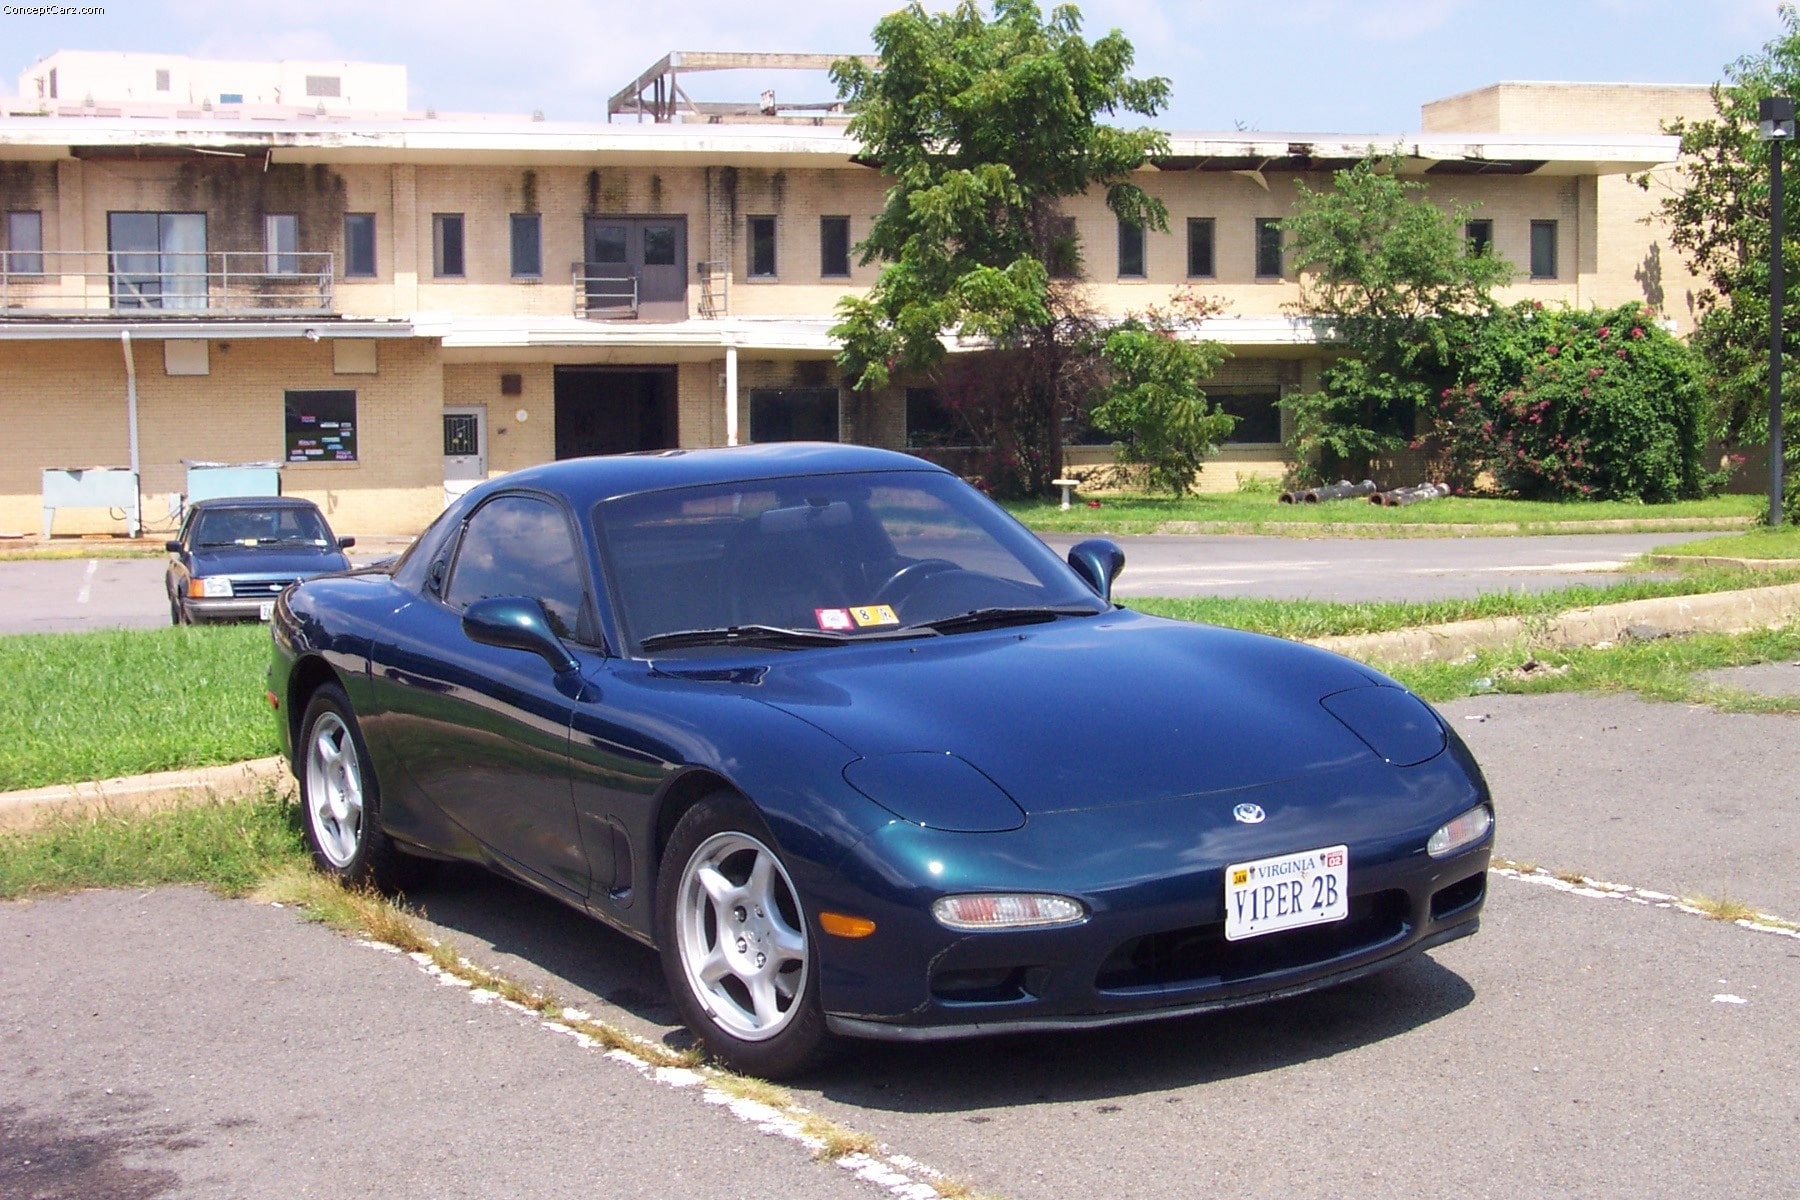 1993 Mazda RX-7 Backgrounds